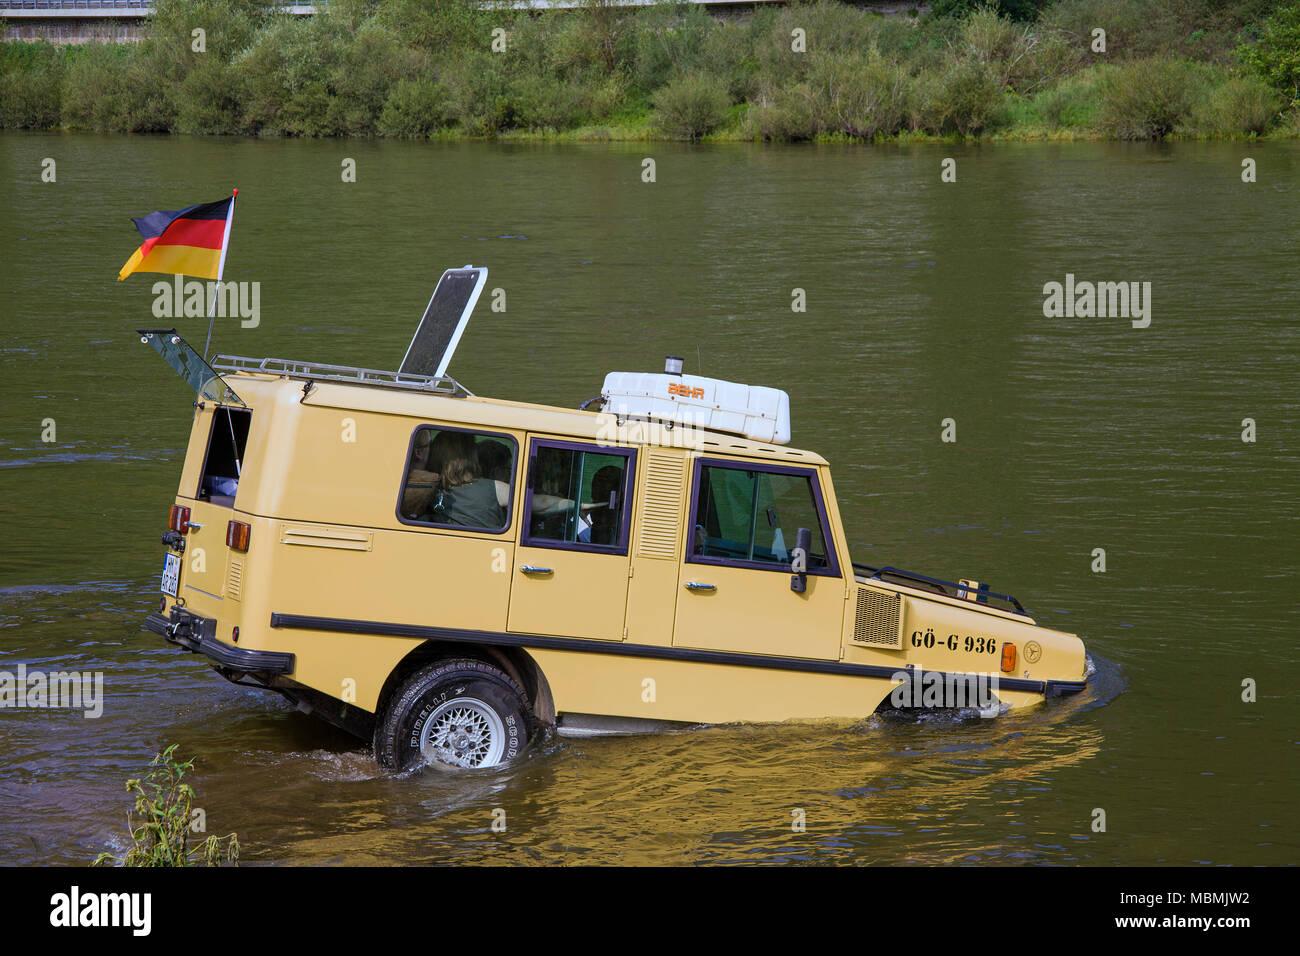 Amphi-Ranger, a german amphibian vehicle on Moselle river at Bruttig-Fankel, Rhineland-Palatinate, Germany Stock Photo